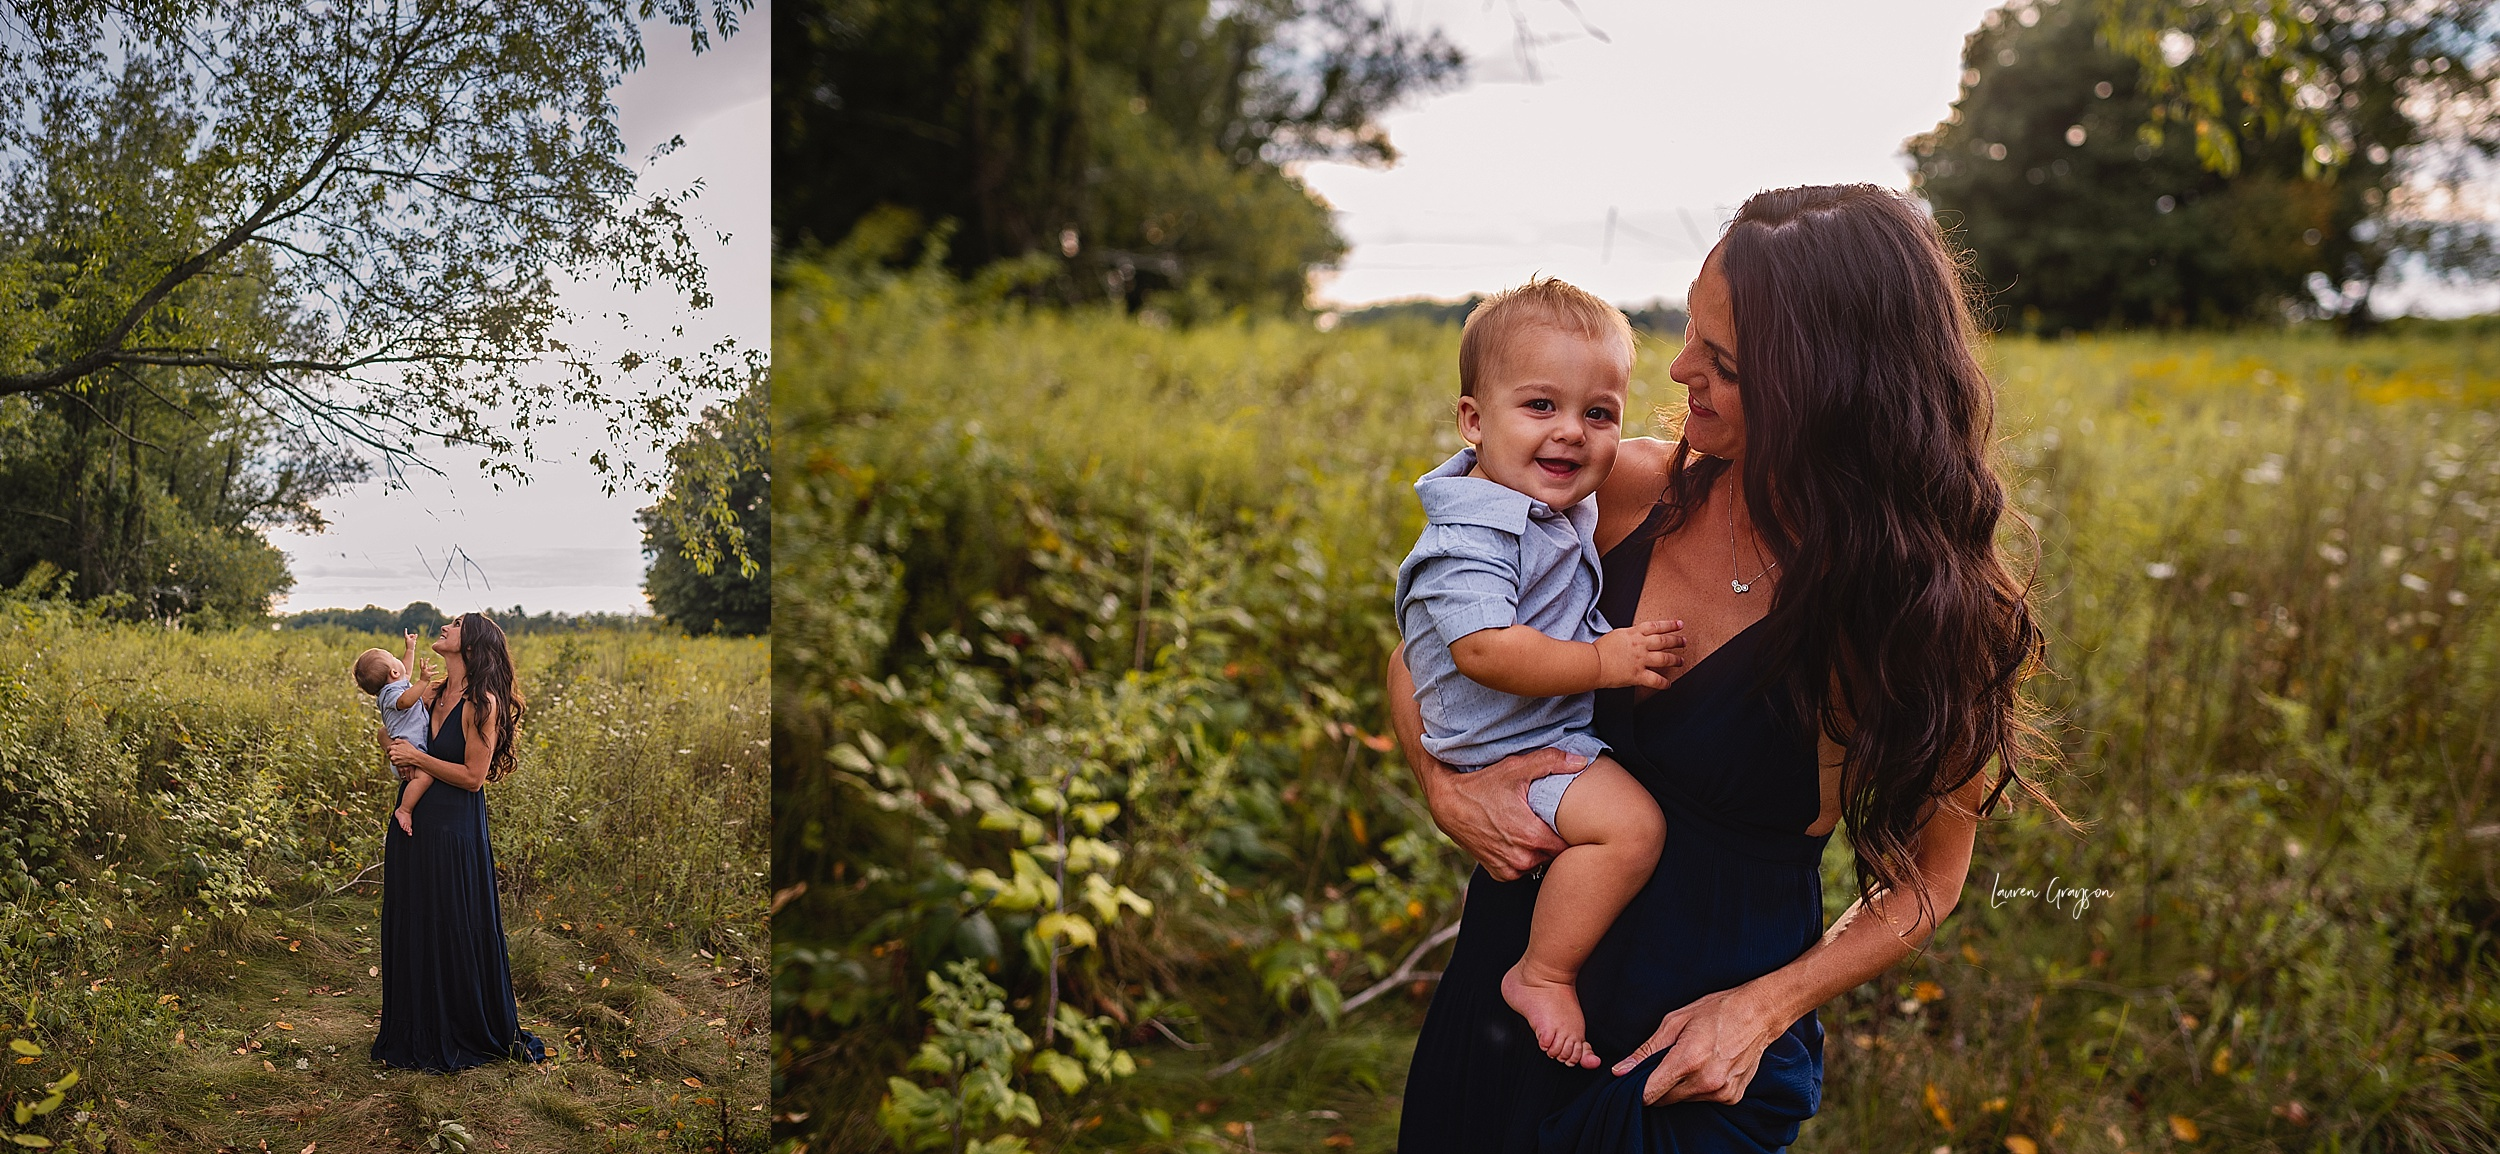 lauren-grayson-photography-cleveland-ohio-photographer-AKRON-family-photos-springfield-bog-cullin-first-birthday_0806.jpg